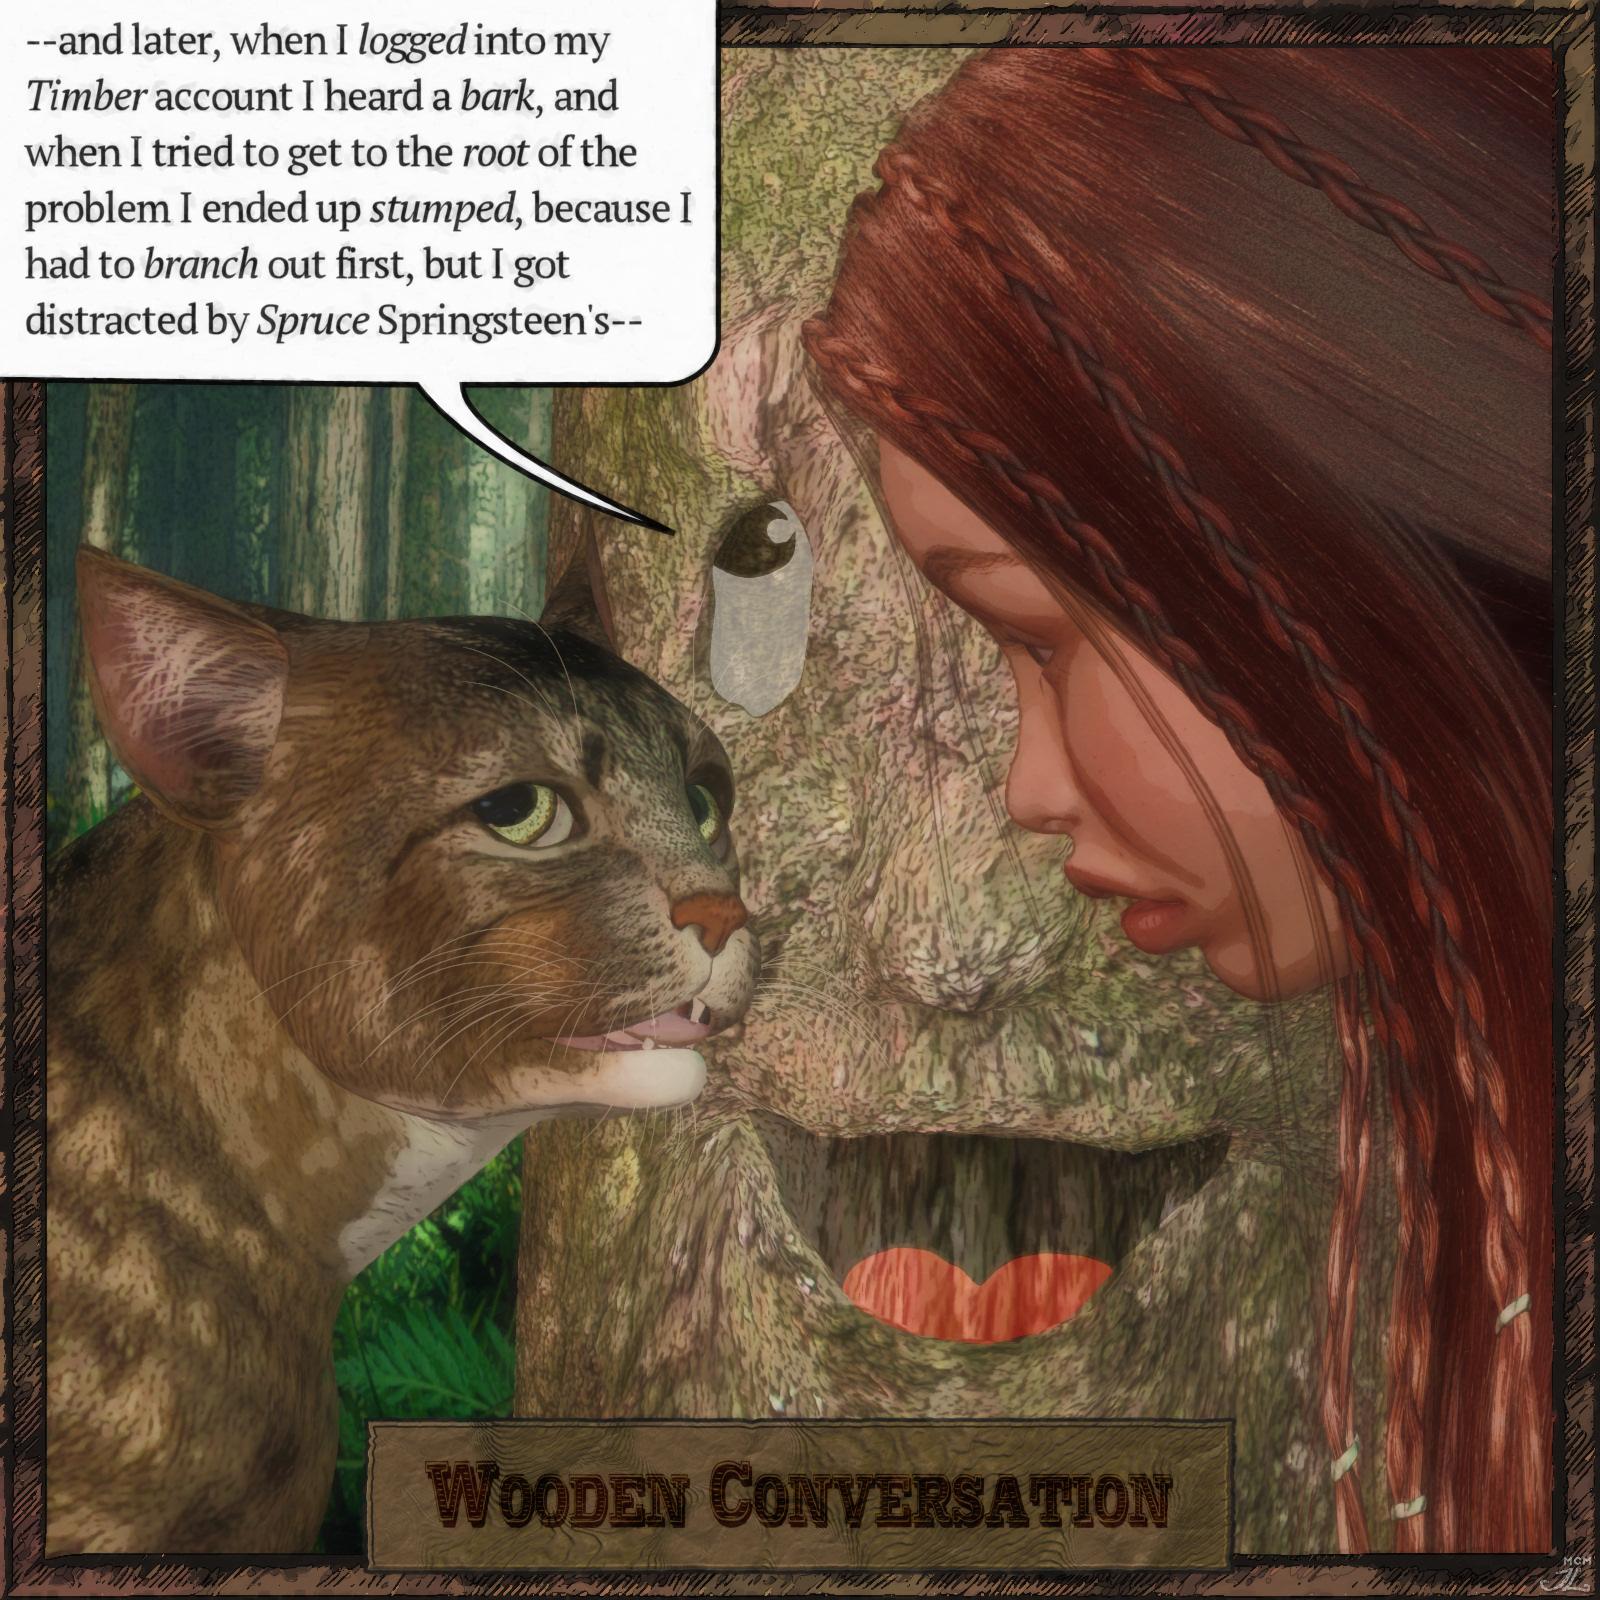 Wooden conversation.jpg